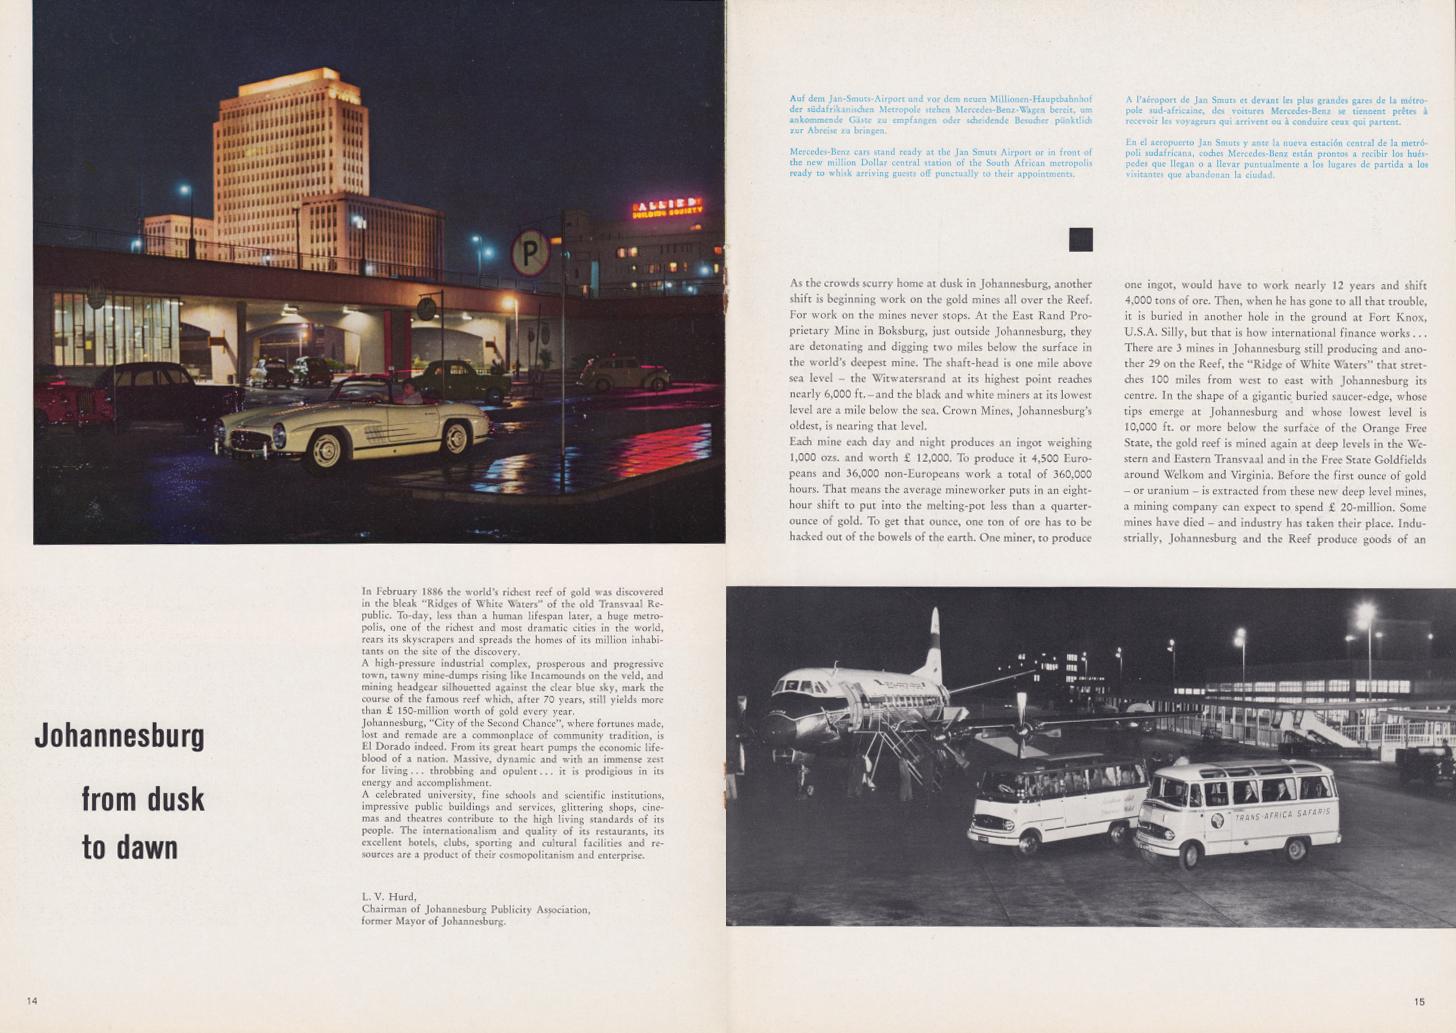 (REVISTA): Periódico In aller welt n.º 34 - Mercedes-Benz no mundo - 1959 - multilingue 008